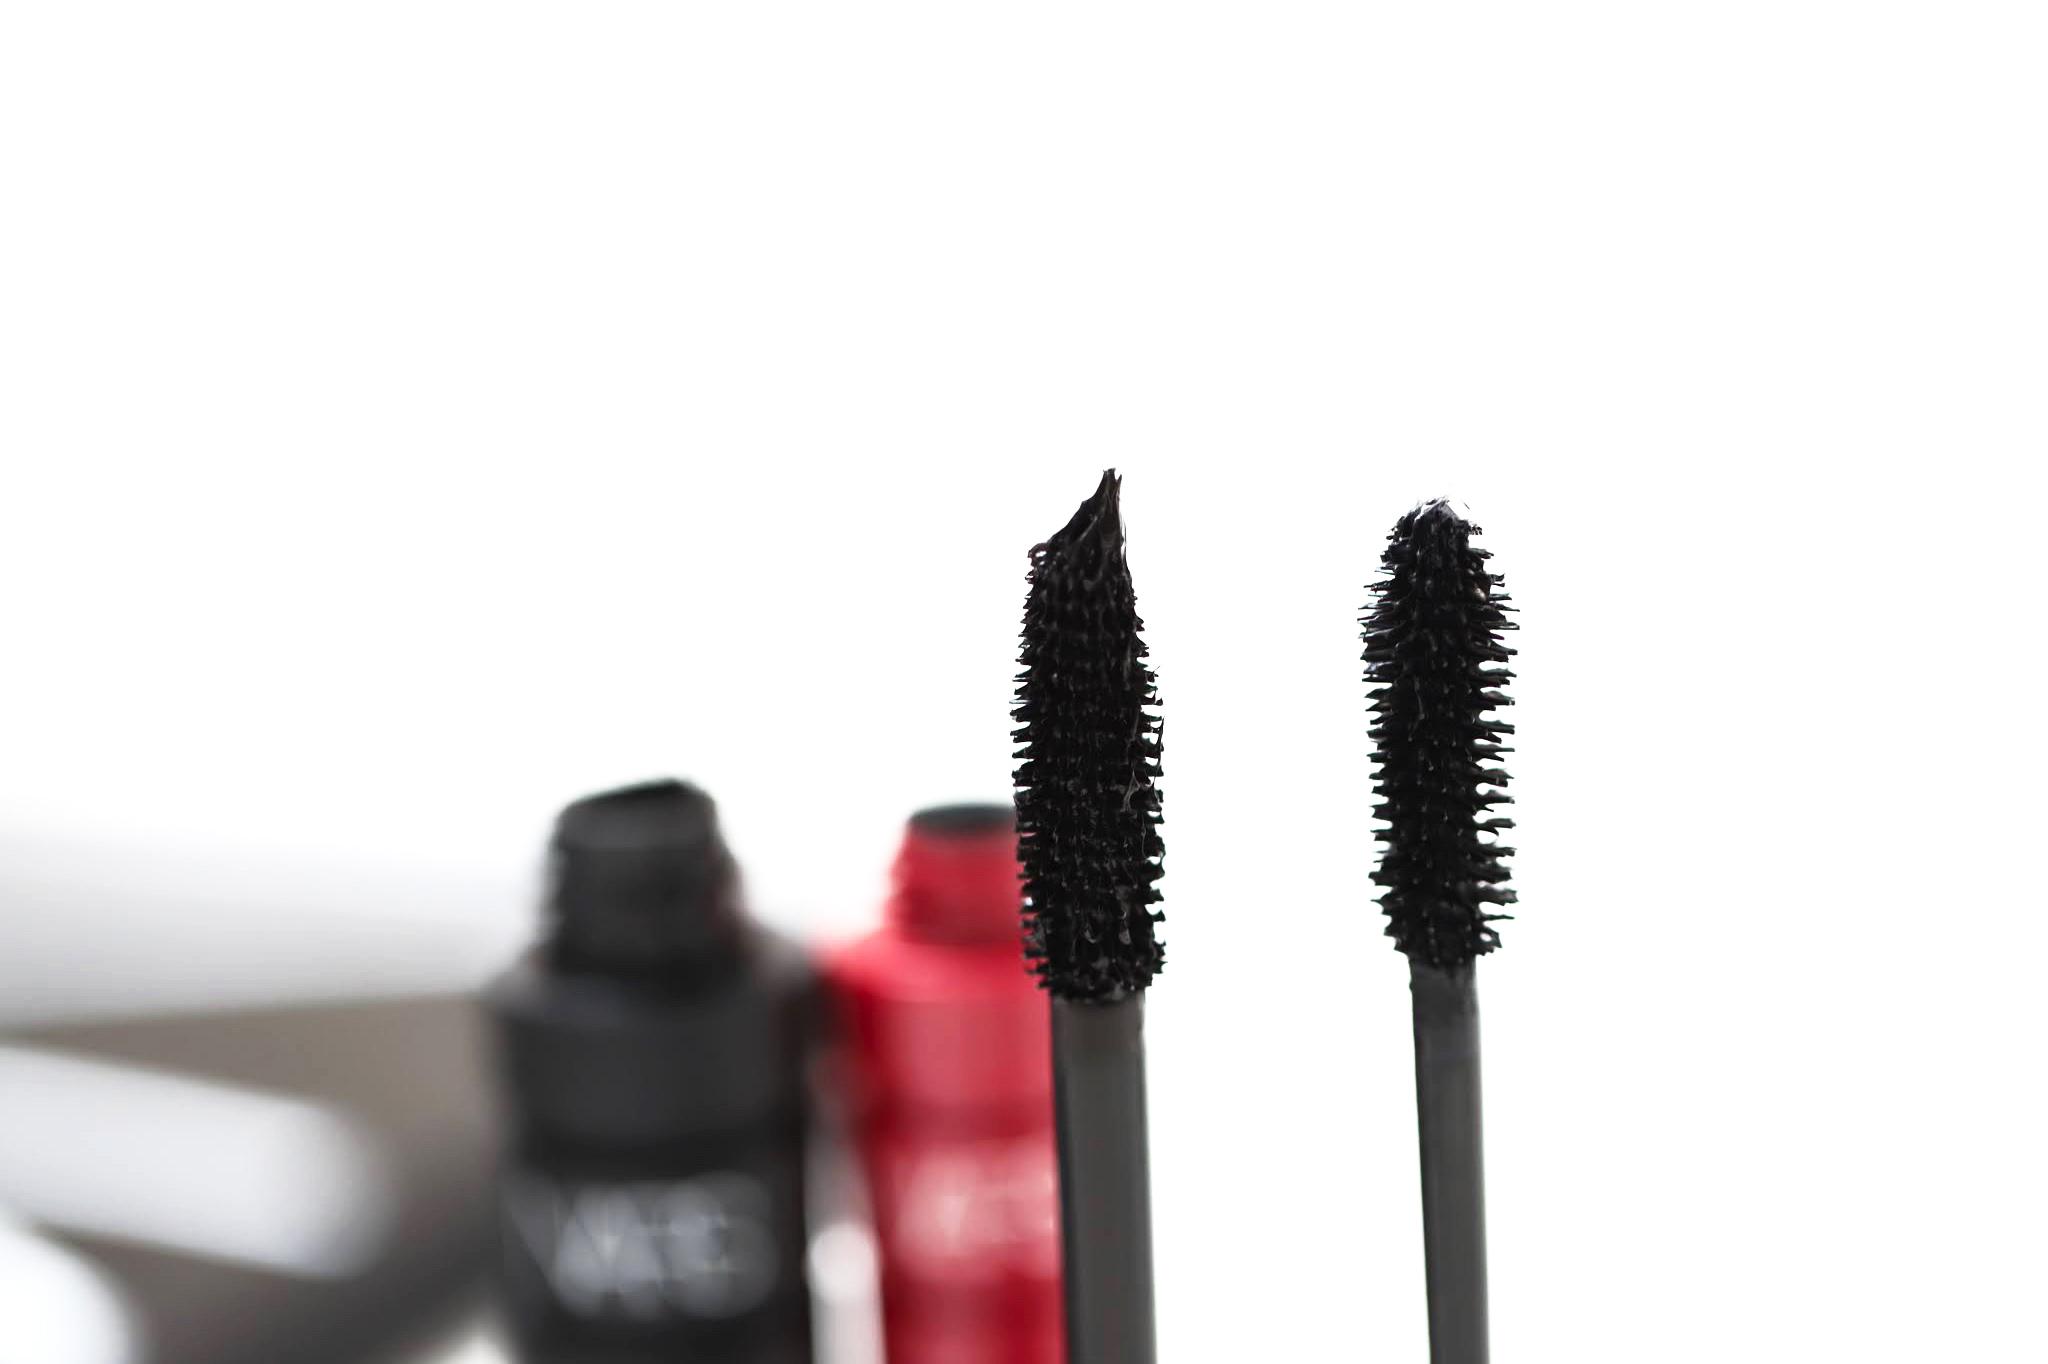 Nars Climax vers Climax Extrême Mascara comparaison